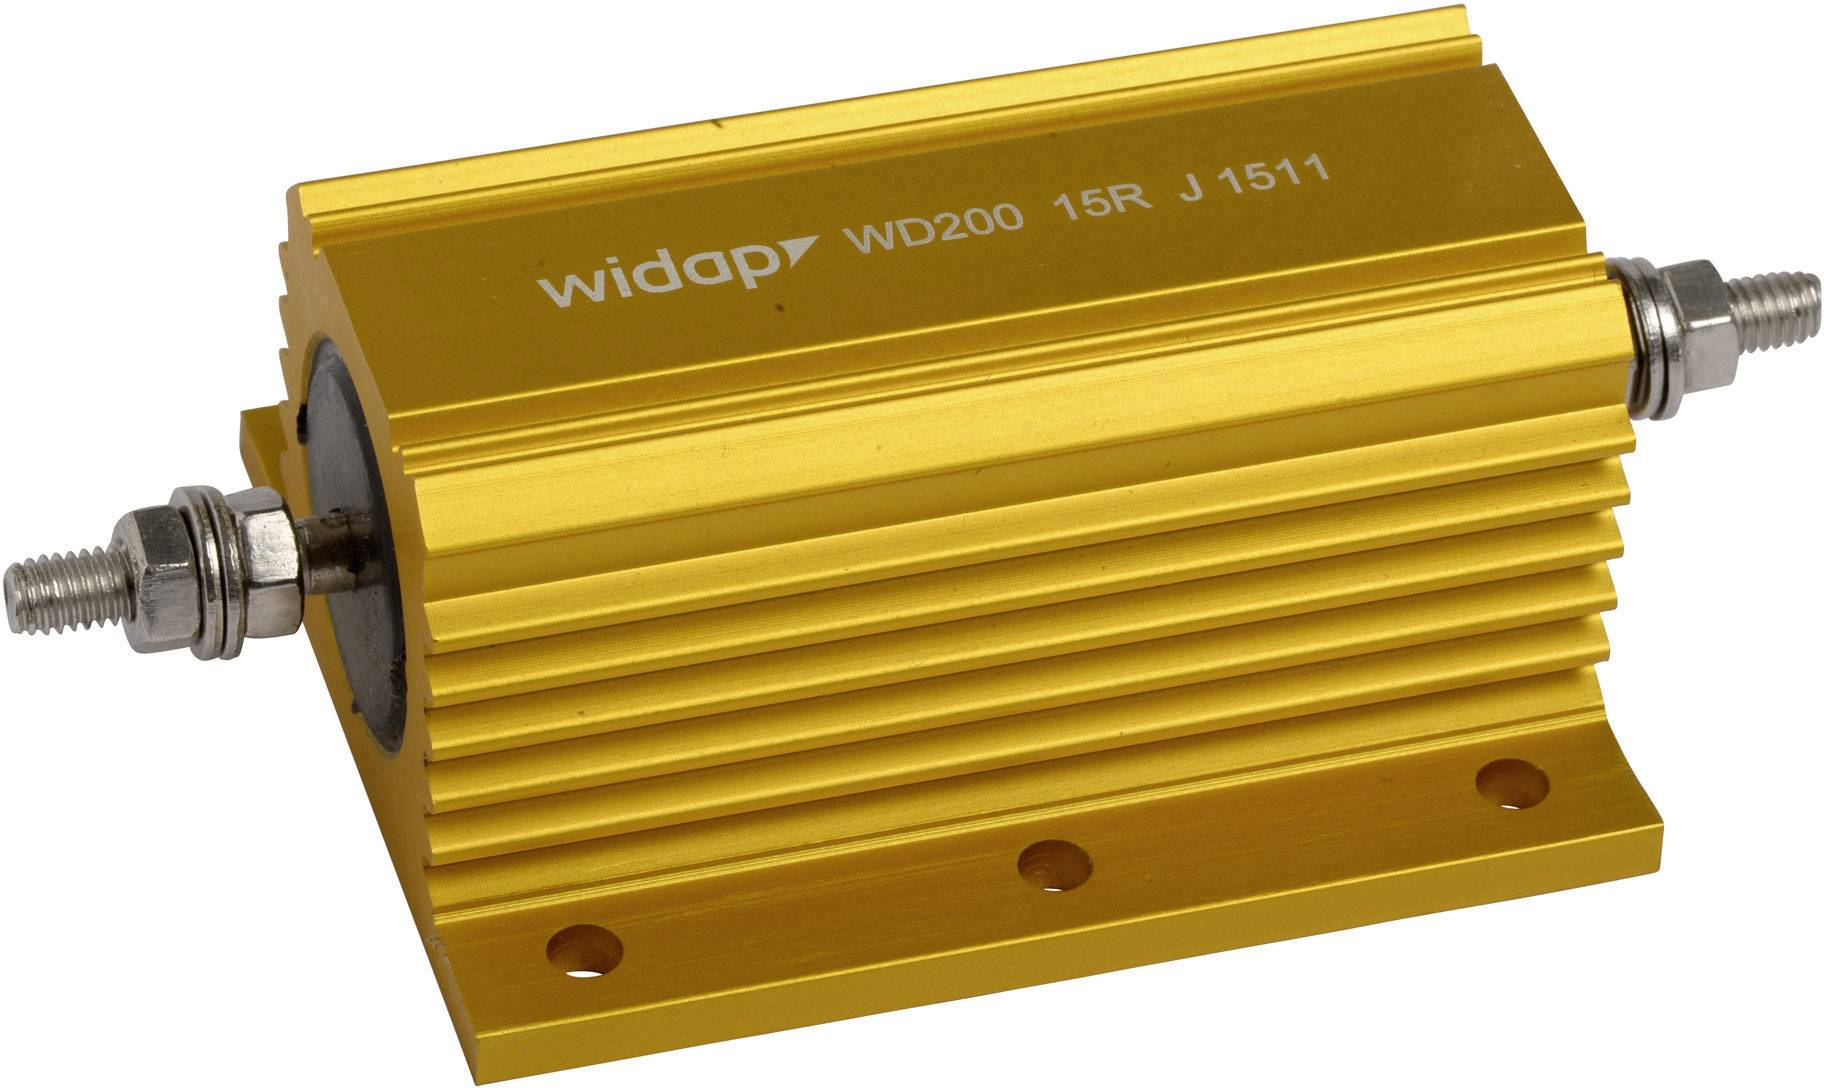 Drôtový rezistor Widap 160177, hodnota odporu 47 Ohm, 300 W, 1 ks